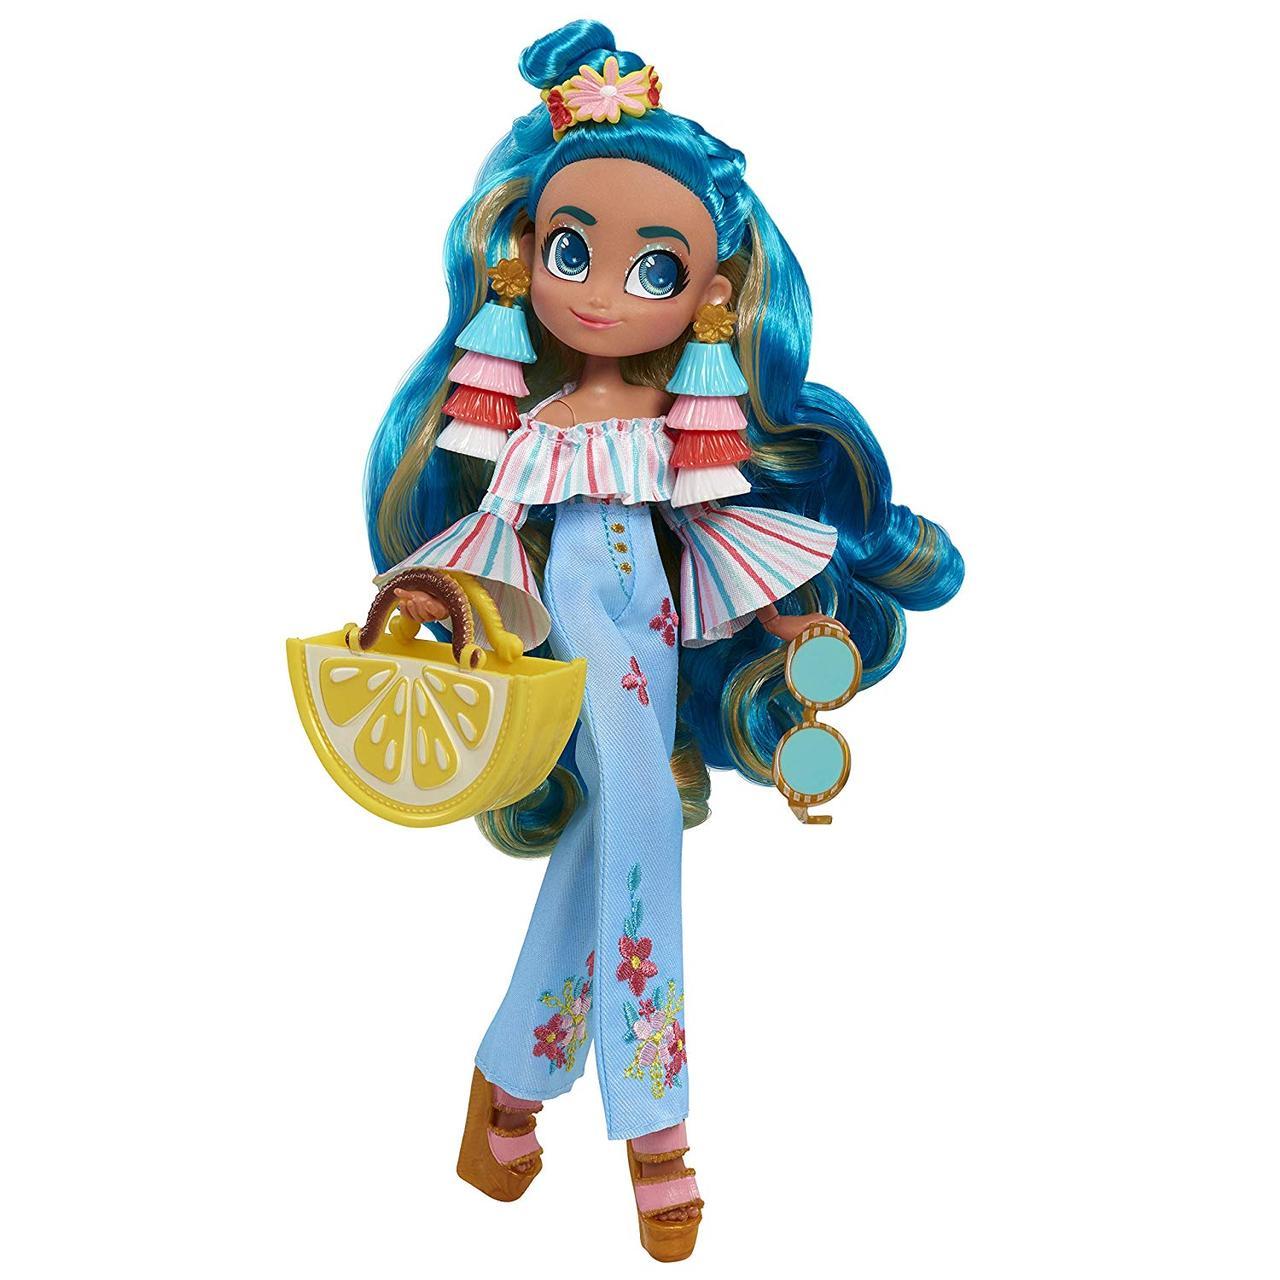 Новинка! Большая Кукла Хэрдораблс Ноа 26 см Оригинал Hairdorables Hairmazing Noah Fashion Doll